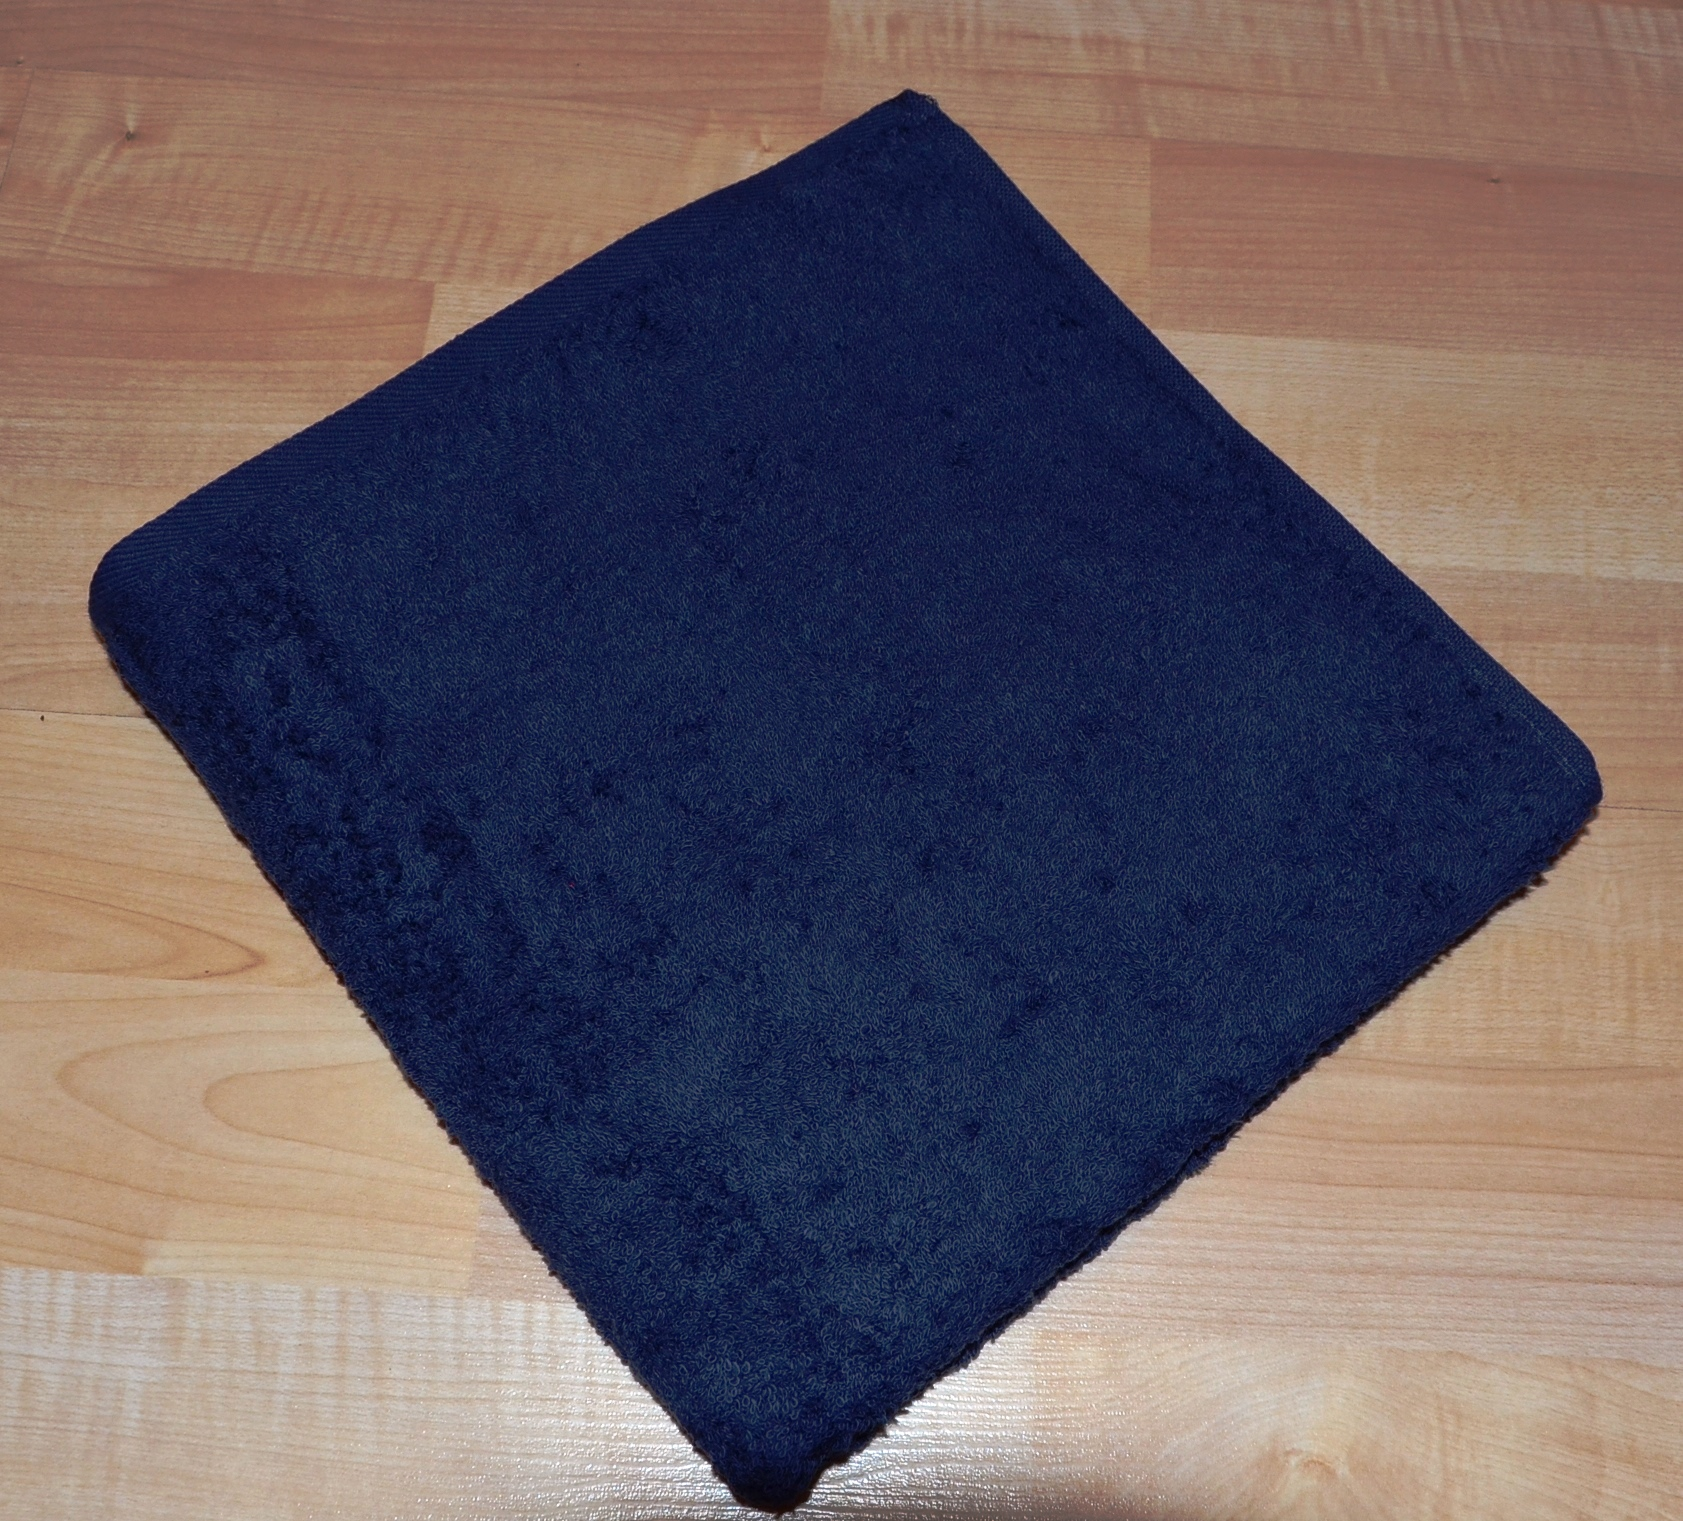 Froté osuška 70x140cm bez proužku 450g tmavě modrá